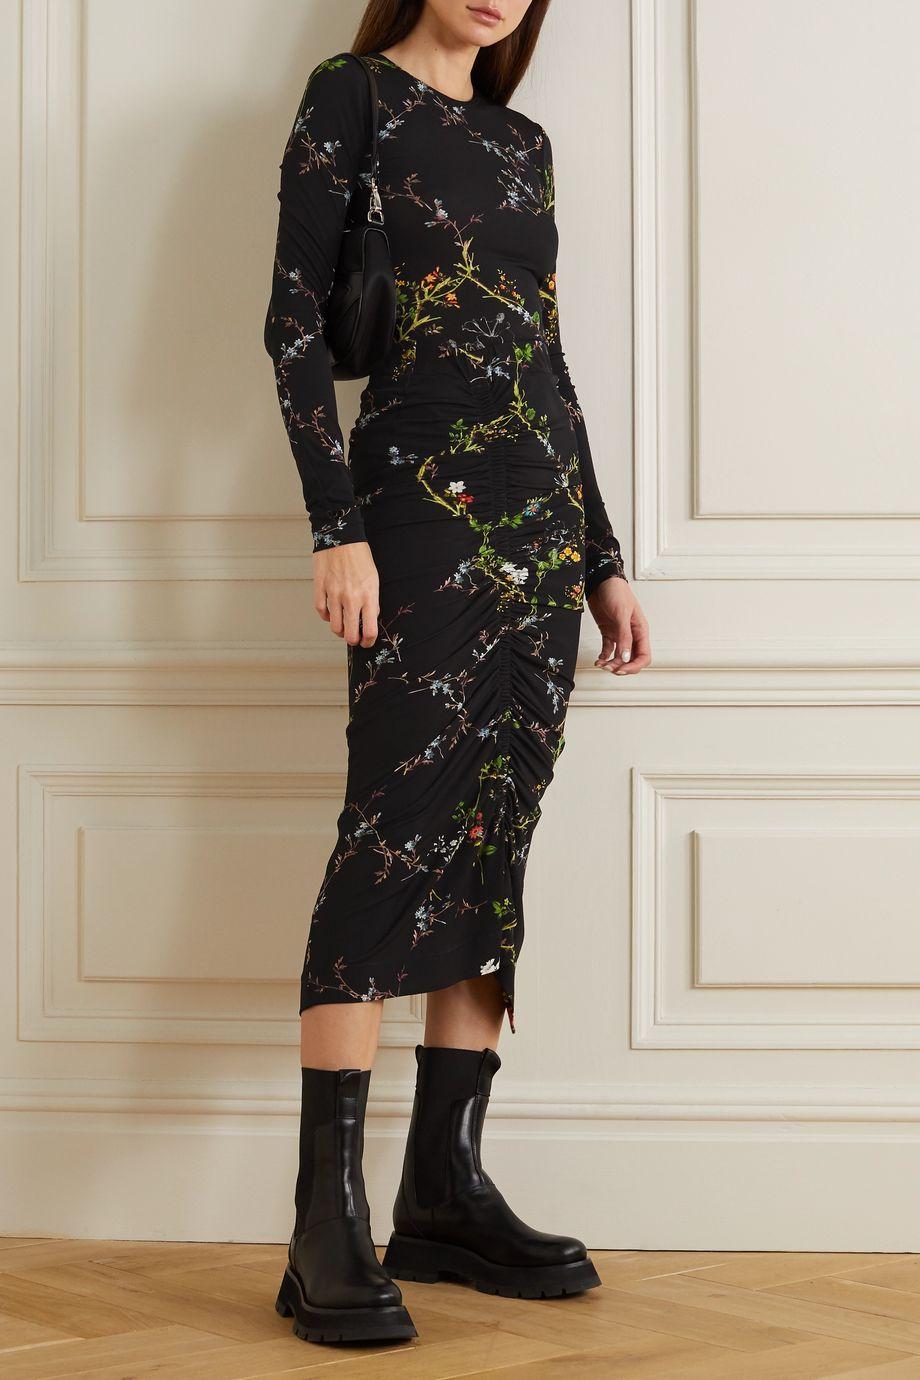 Preen by Thornton Bregazzi Nicole floral-print stretch-crepe top